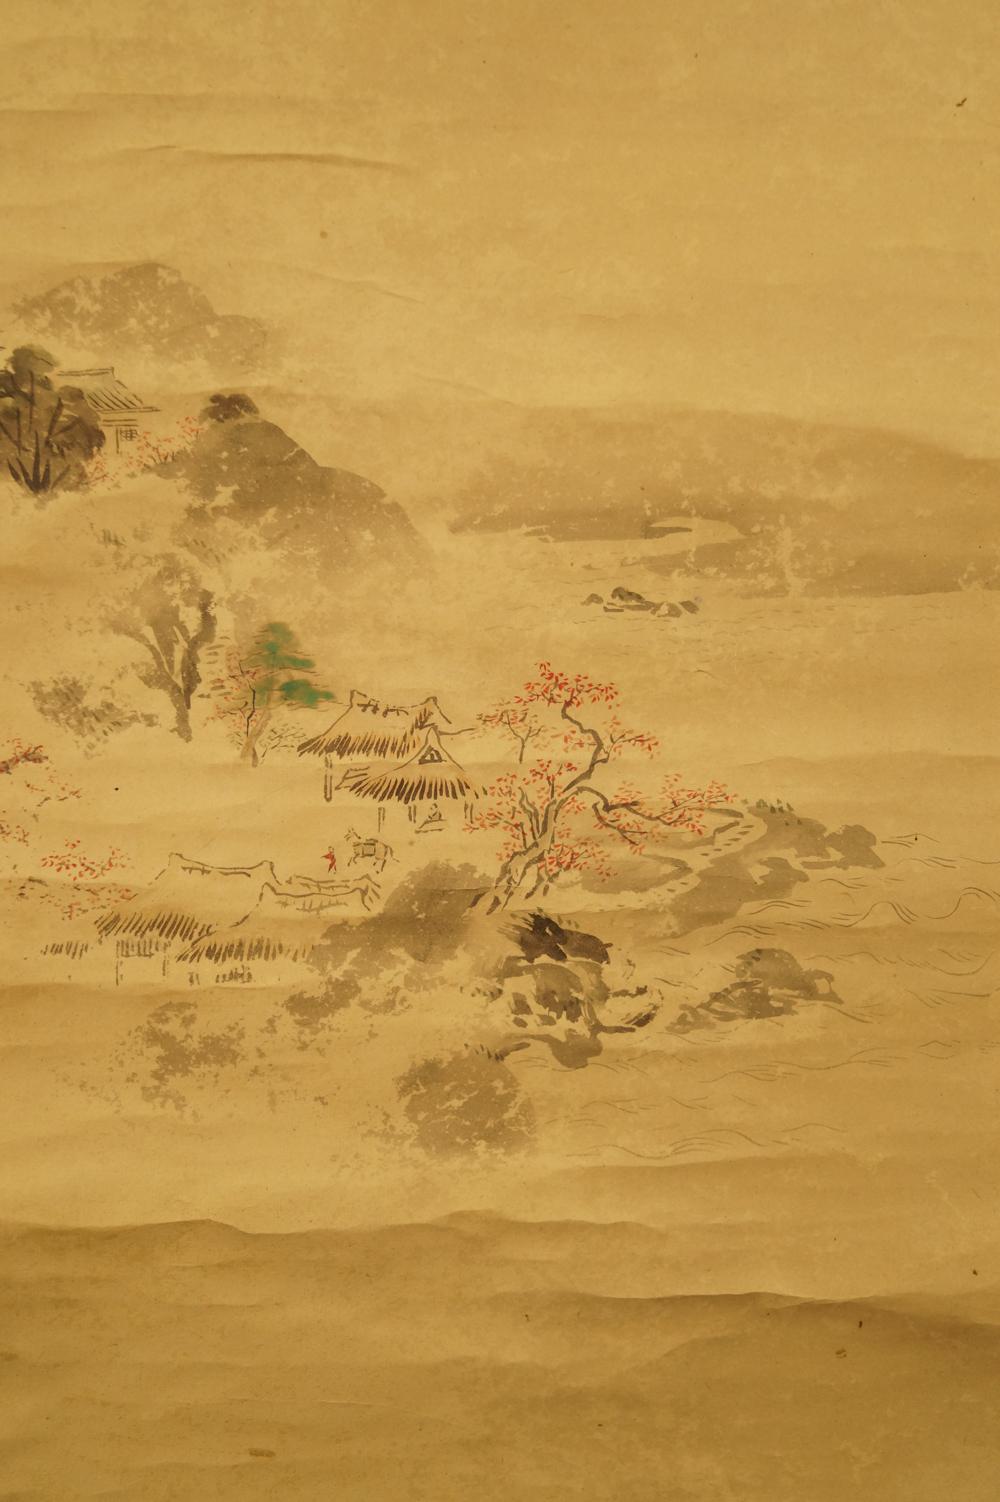 Fuji-san im Sommer und Herbst - 2er Set japanische Rollgemälde (Kakejiku, Kakemono)